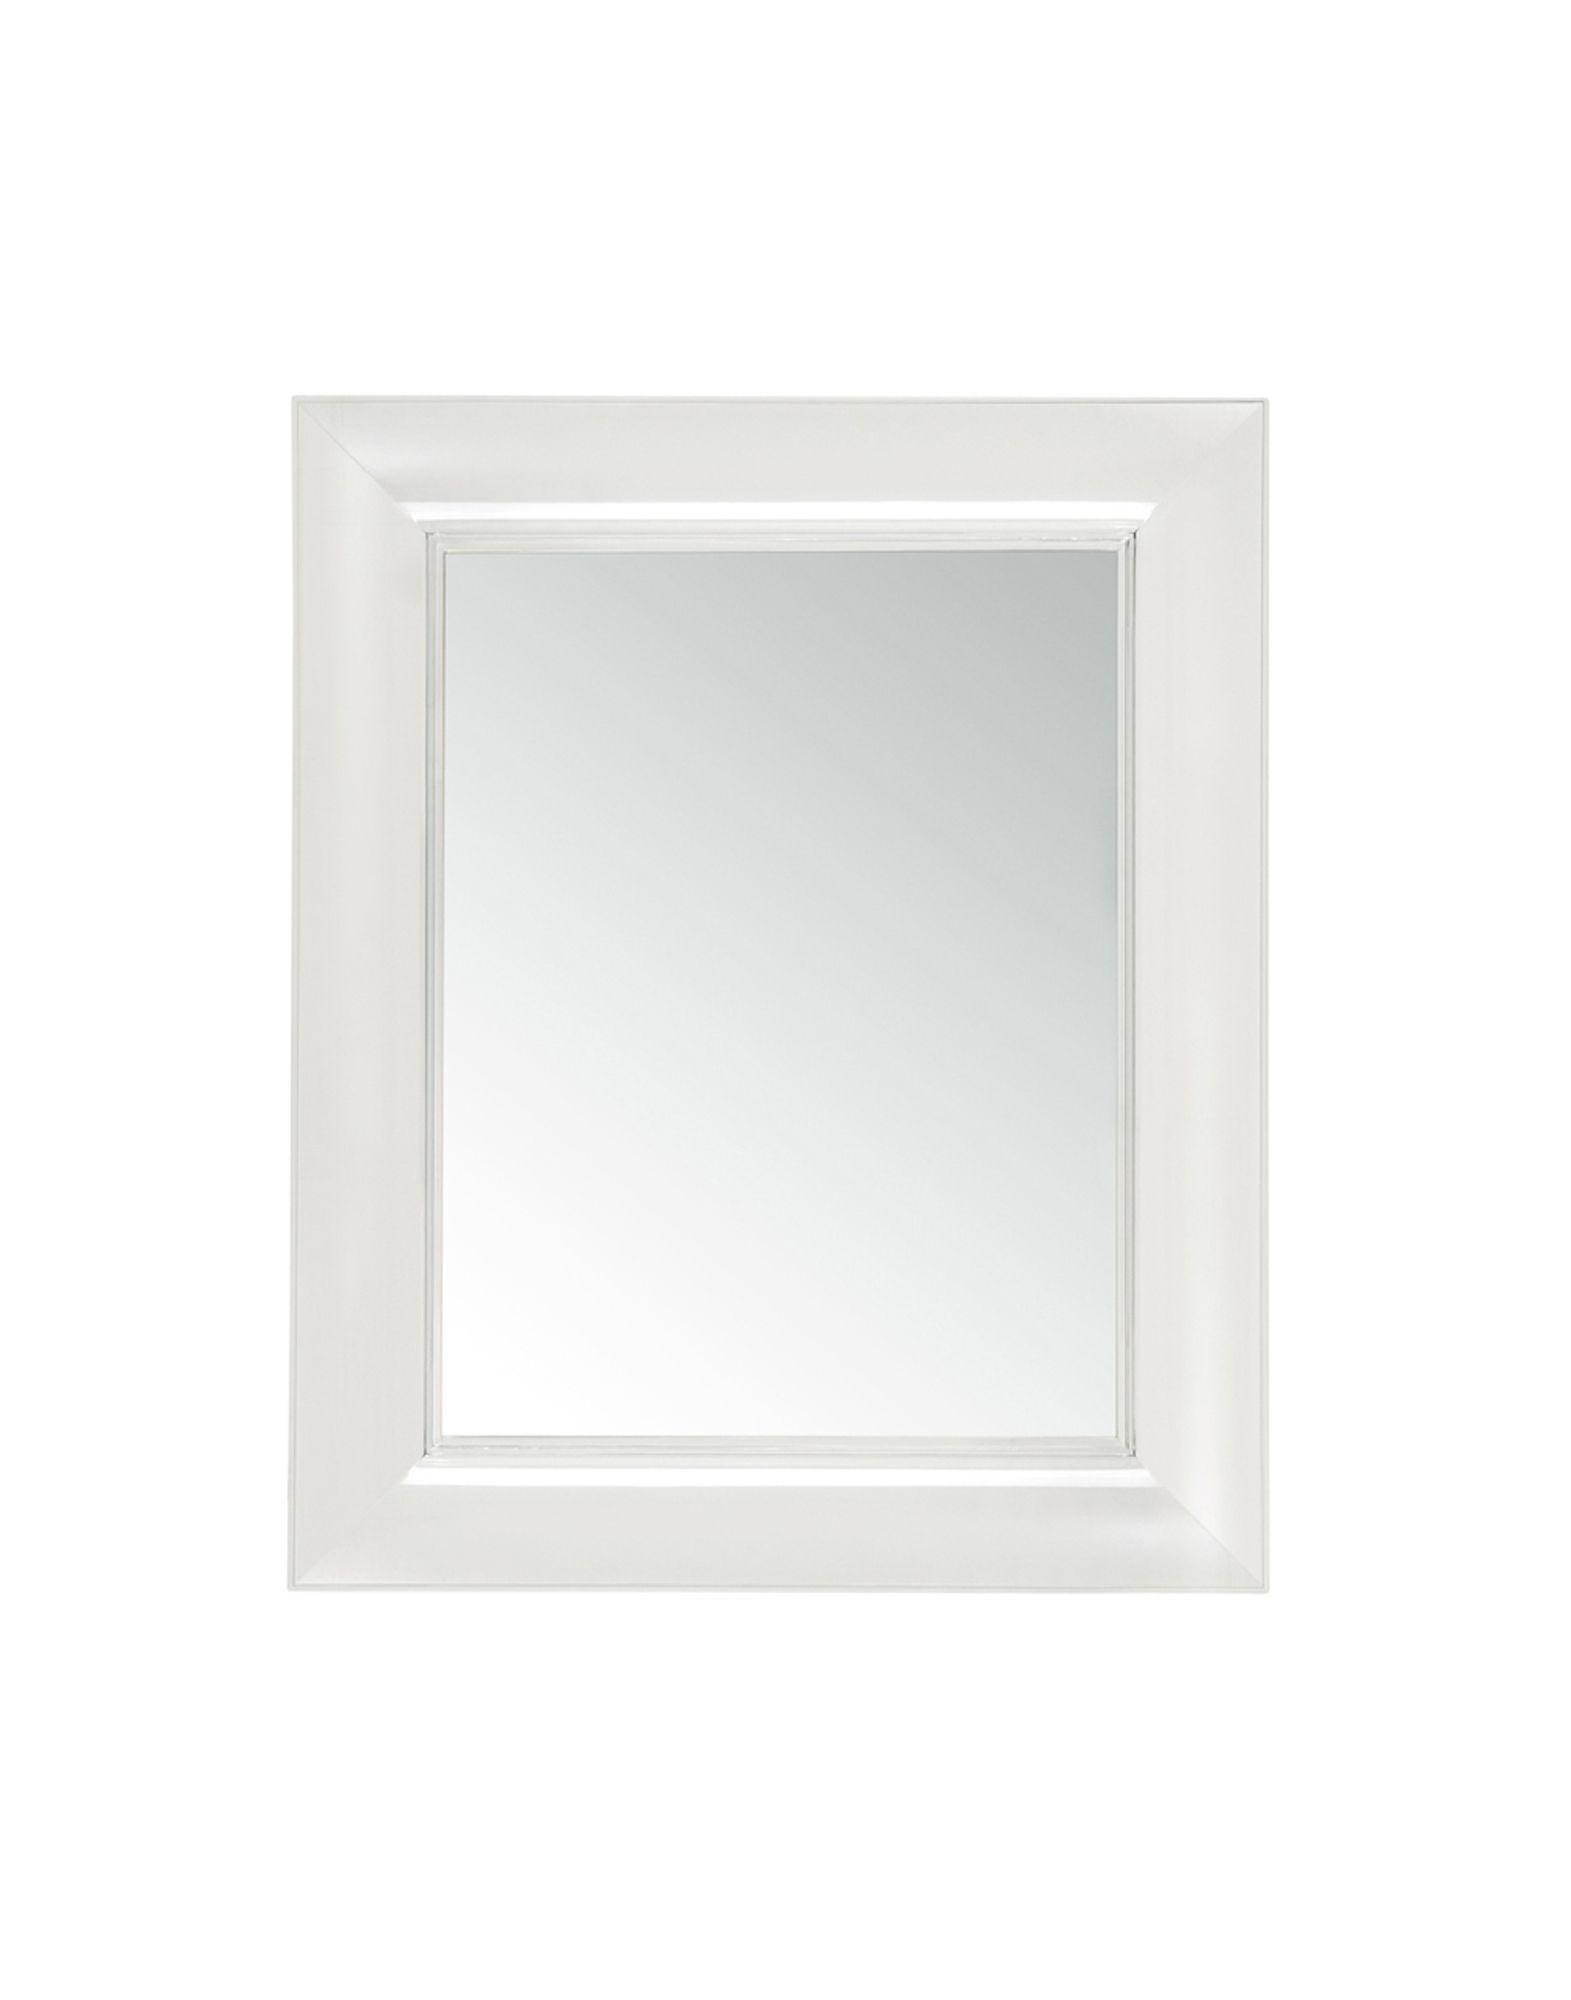 Kartell specchio francois ghost cristallo specchi - Specchio kartell prezzi ...